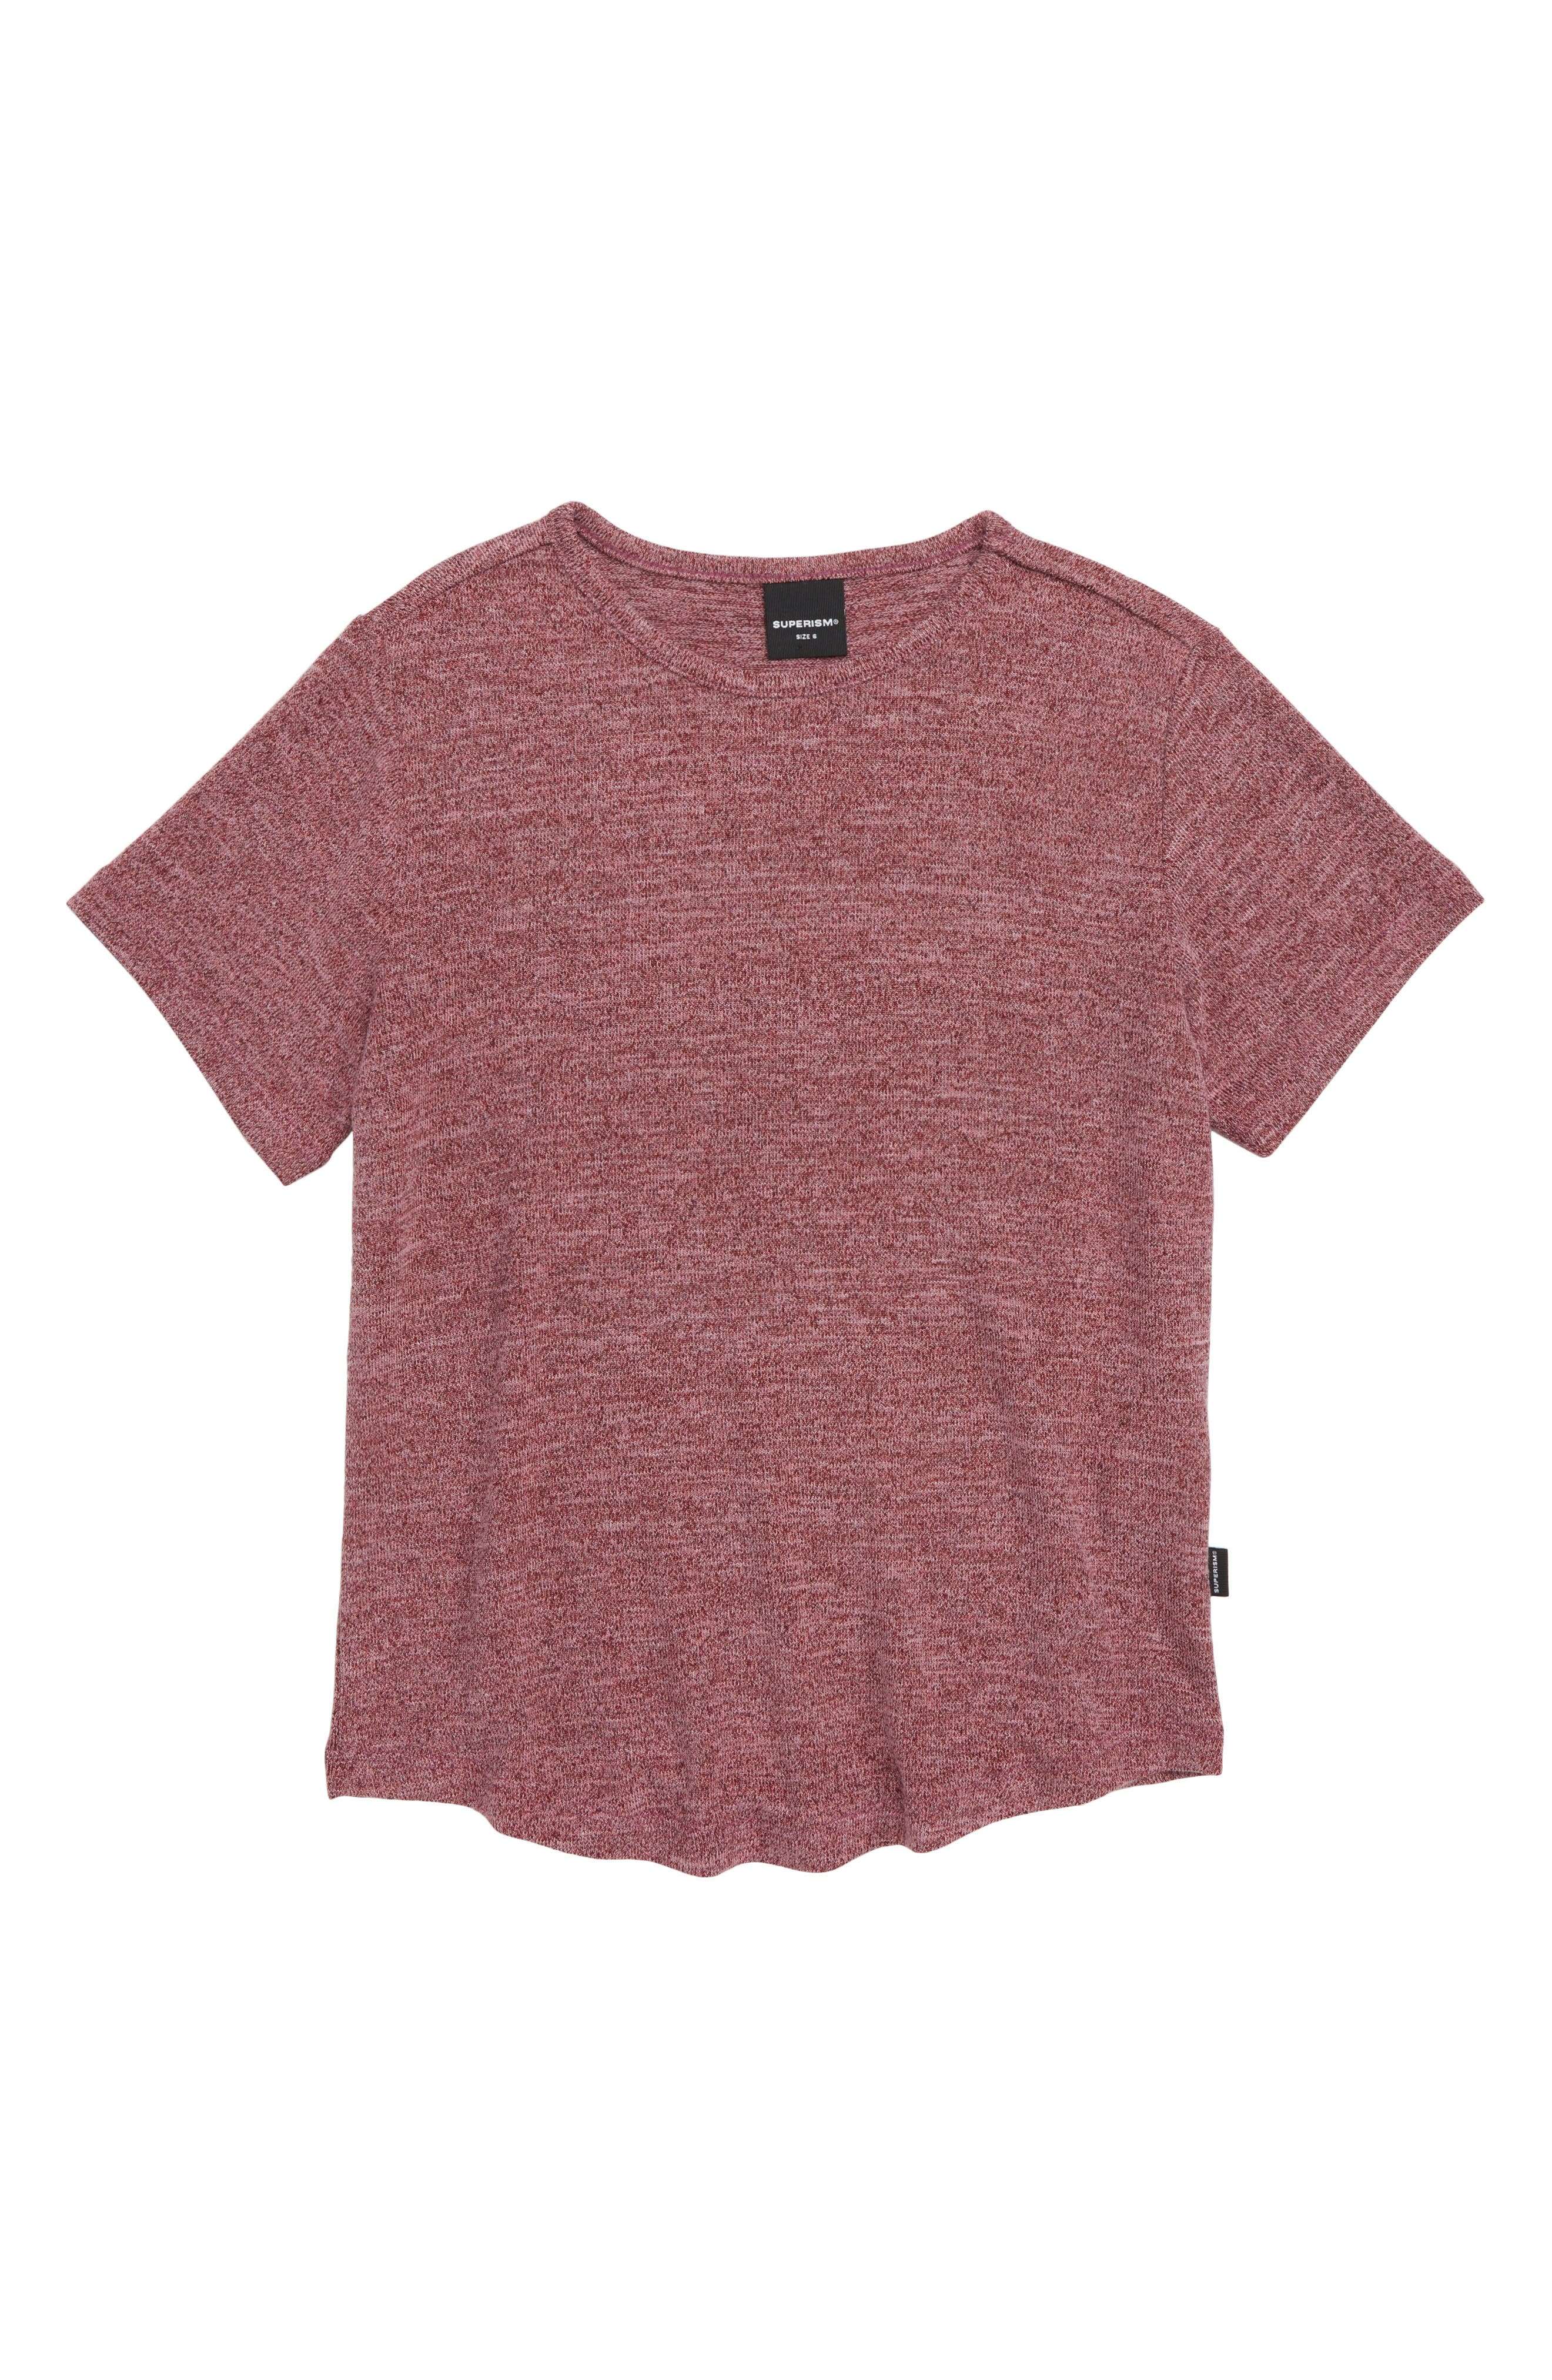 Landon Stretch T-Shirt,                         Main,                         color, BURGUNDY